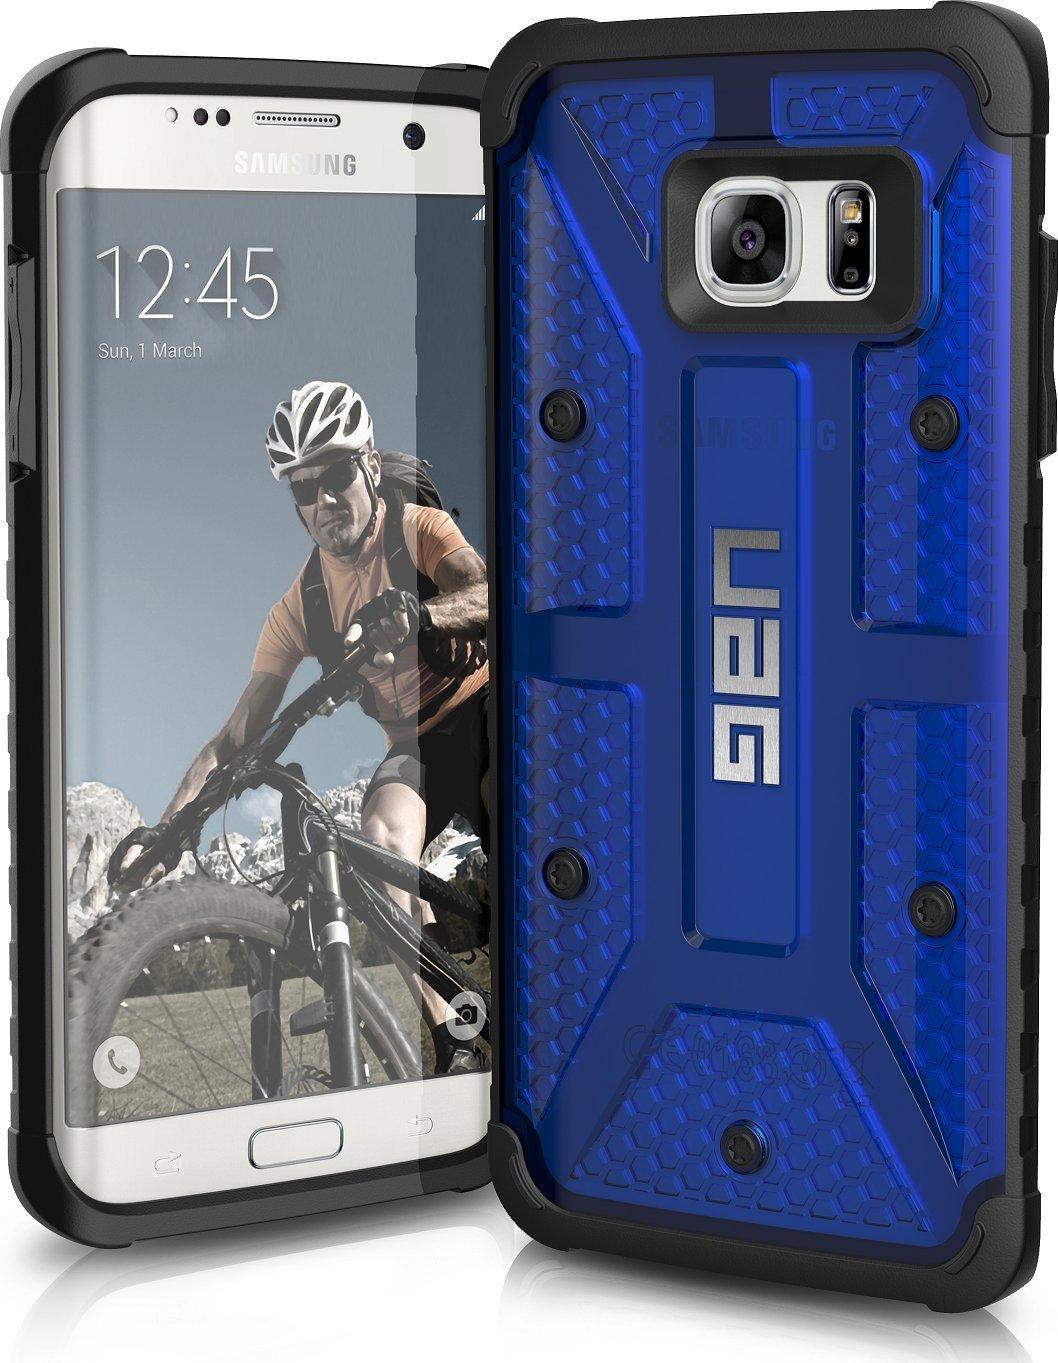 UAG Θήκη Feather-Light Composite Samsung Galaxy S7 Edge - Cobalt (GLXS7EDGE-CBT)